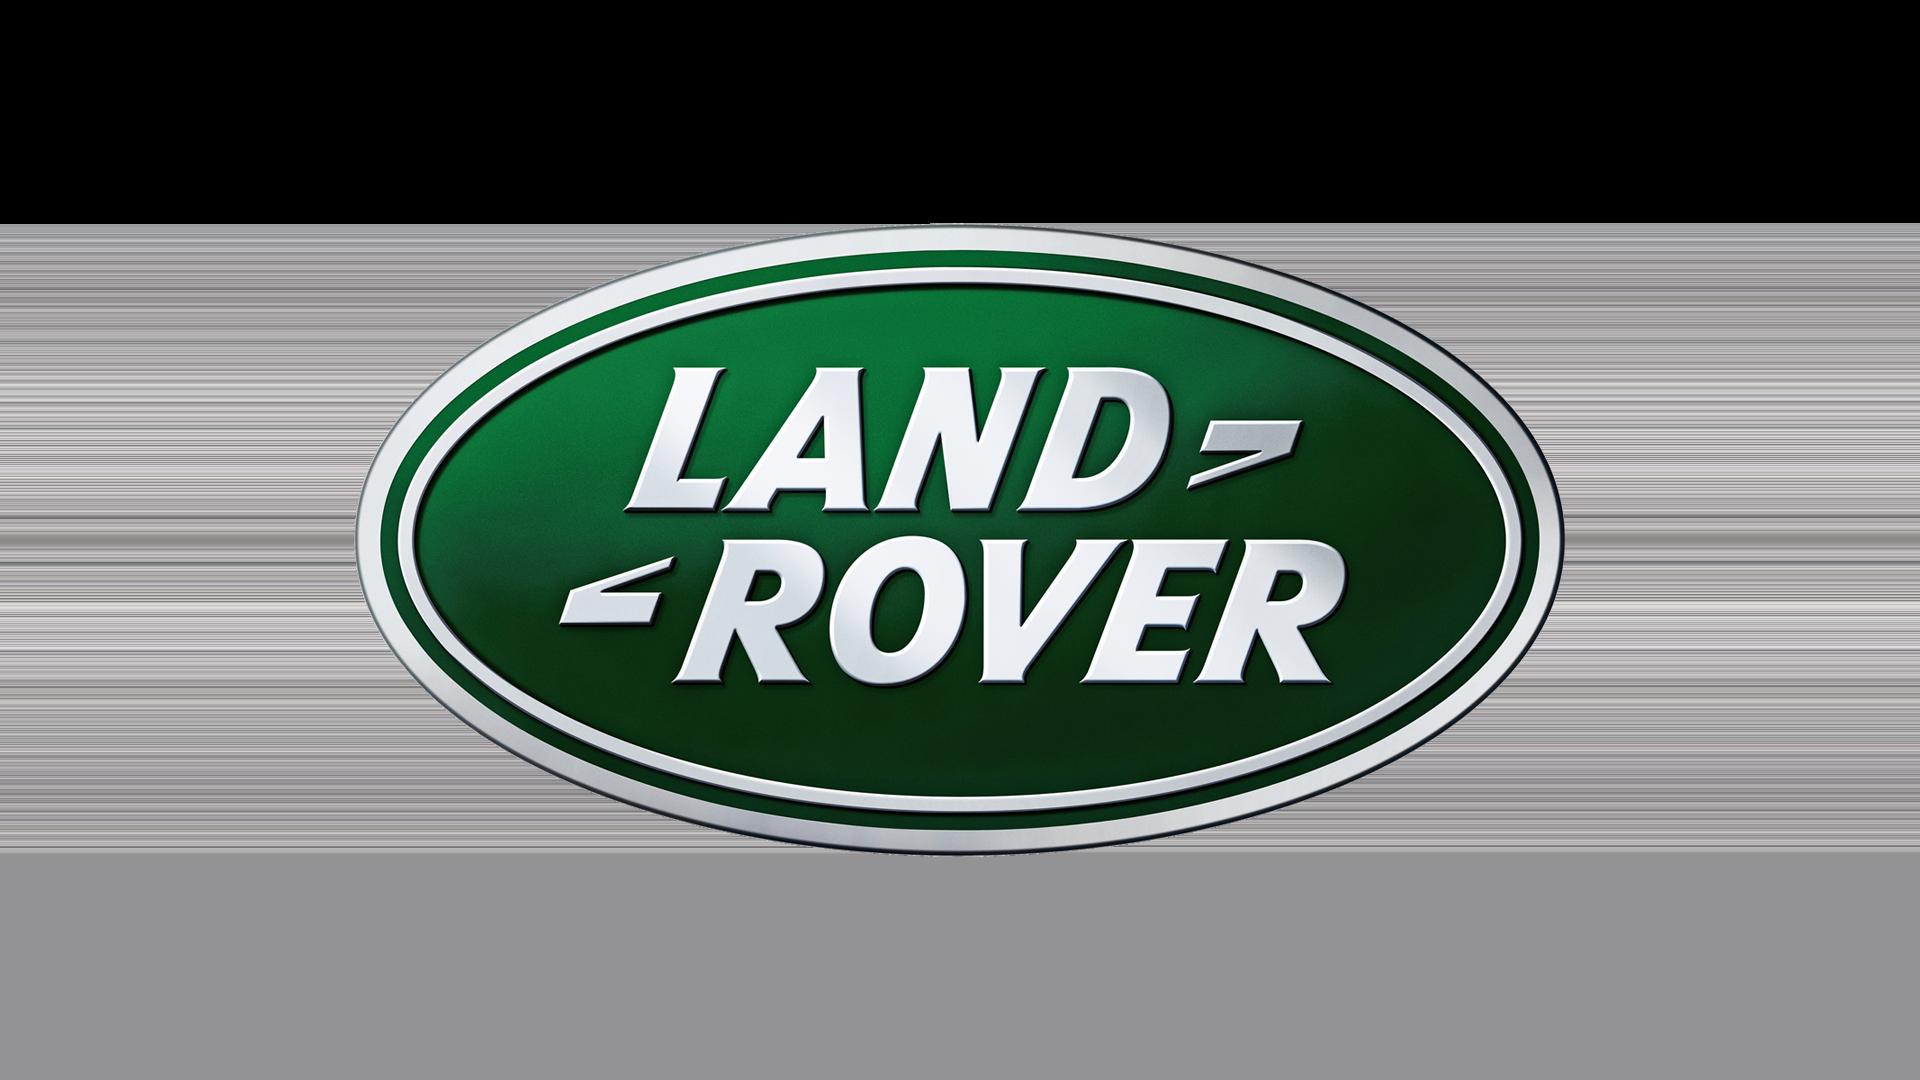 Land Rover Colorado Springs PrePaid Maintenance